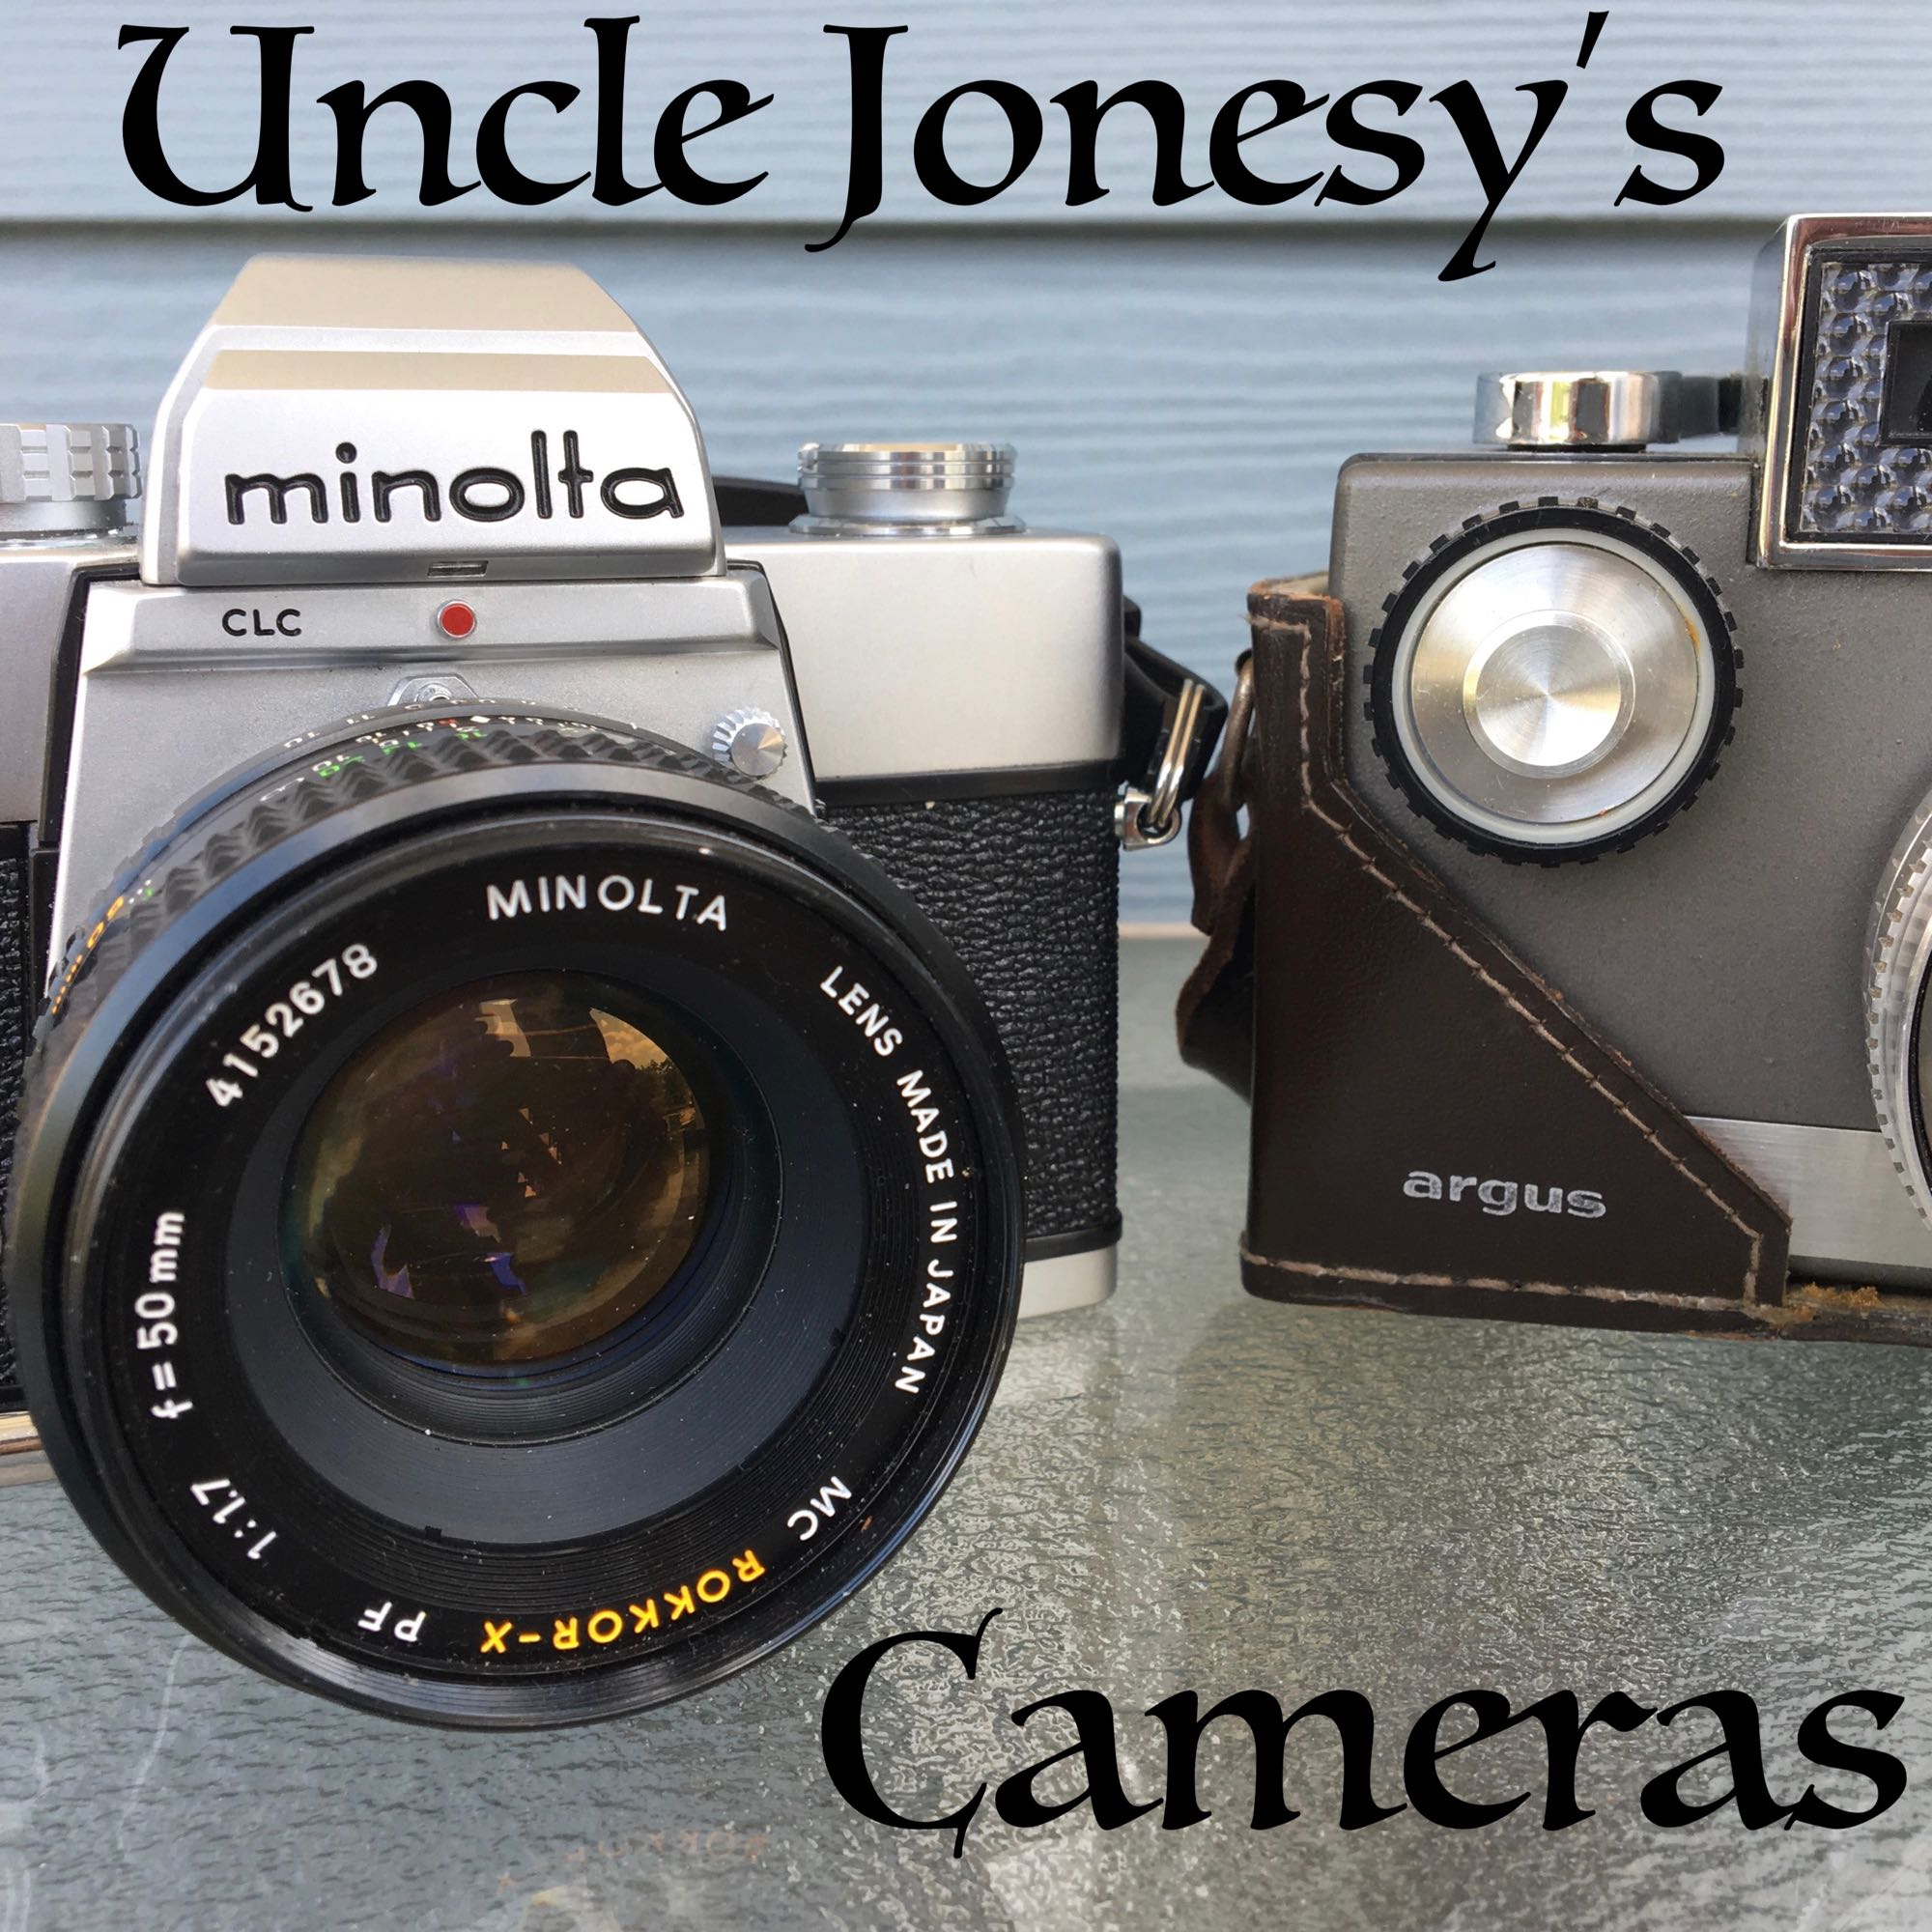 Uncle Jonesy's Cameras show art